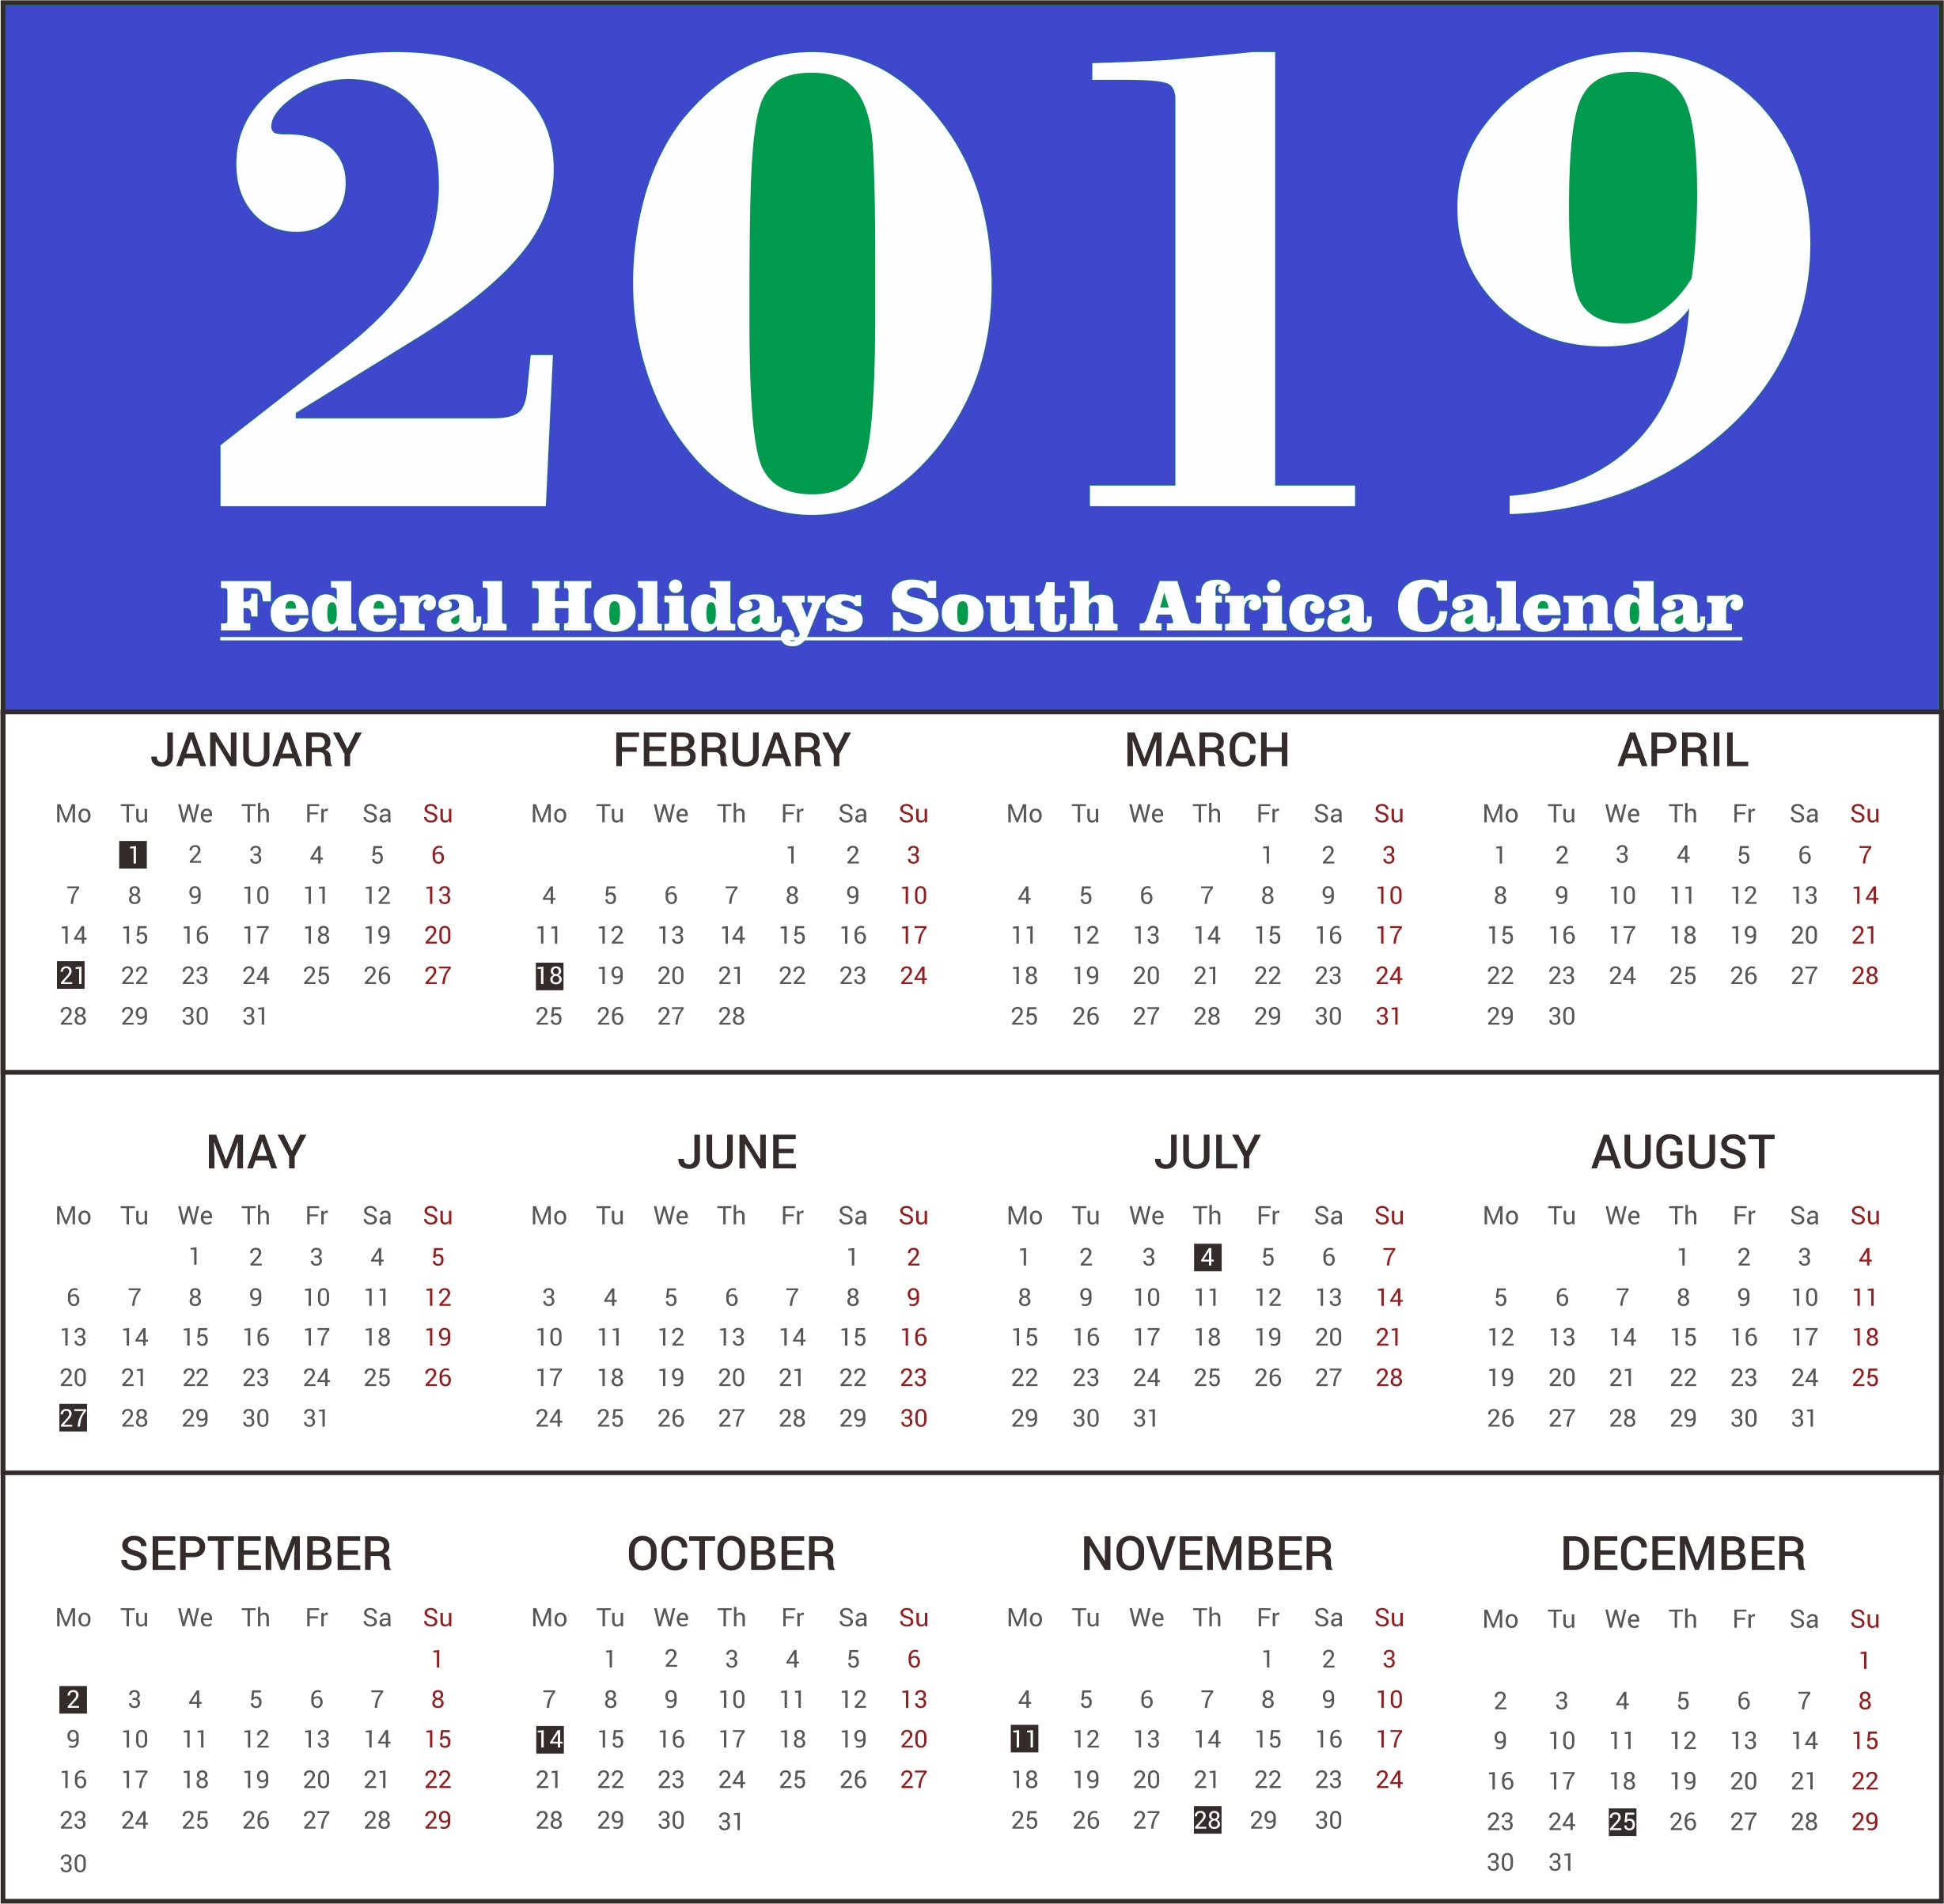 2019 South Africa Federal Holidays Calendar southafrica calendar 2019calendar